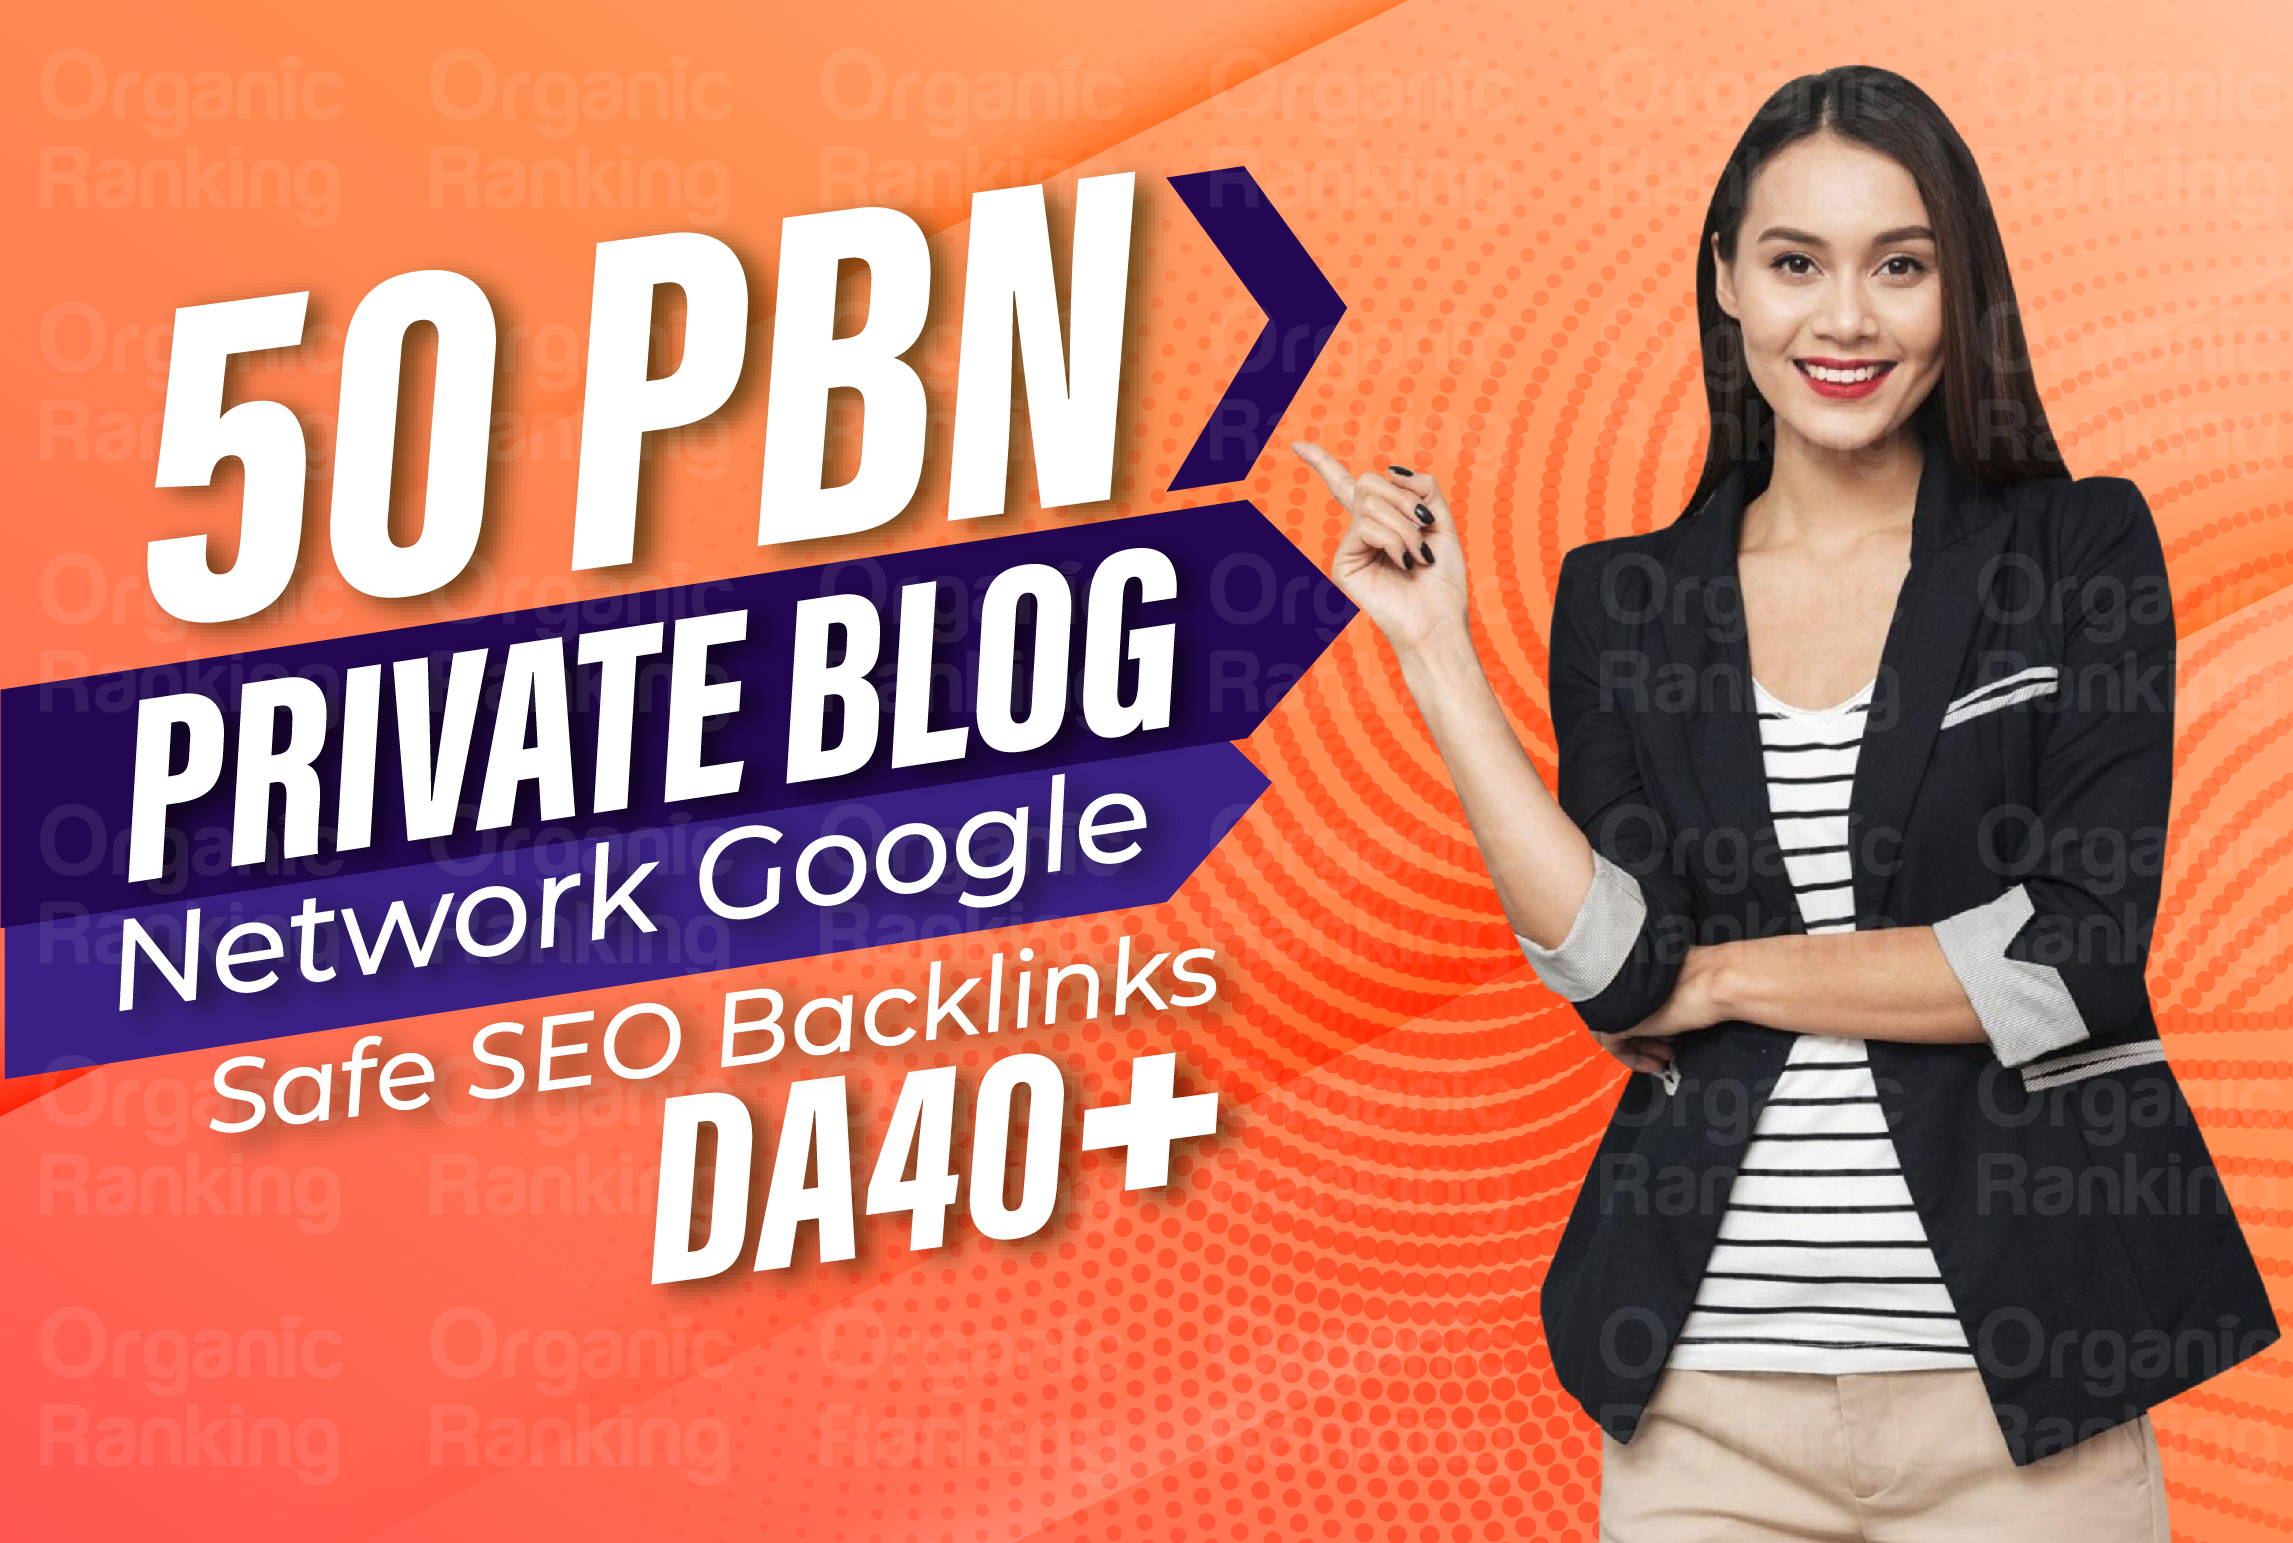 DA 40 plus 50 PBN high authority permanent backlinks